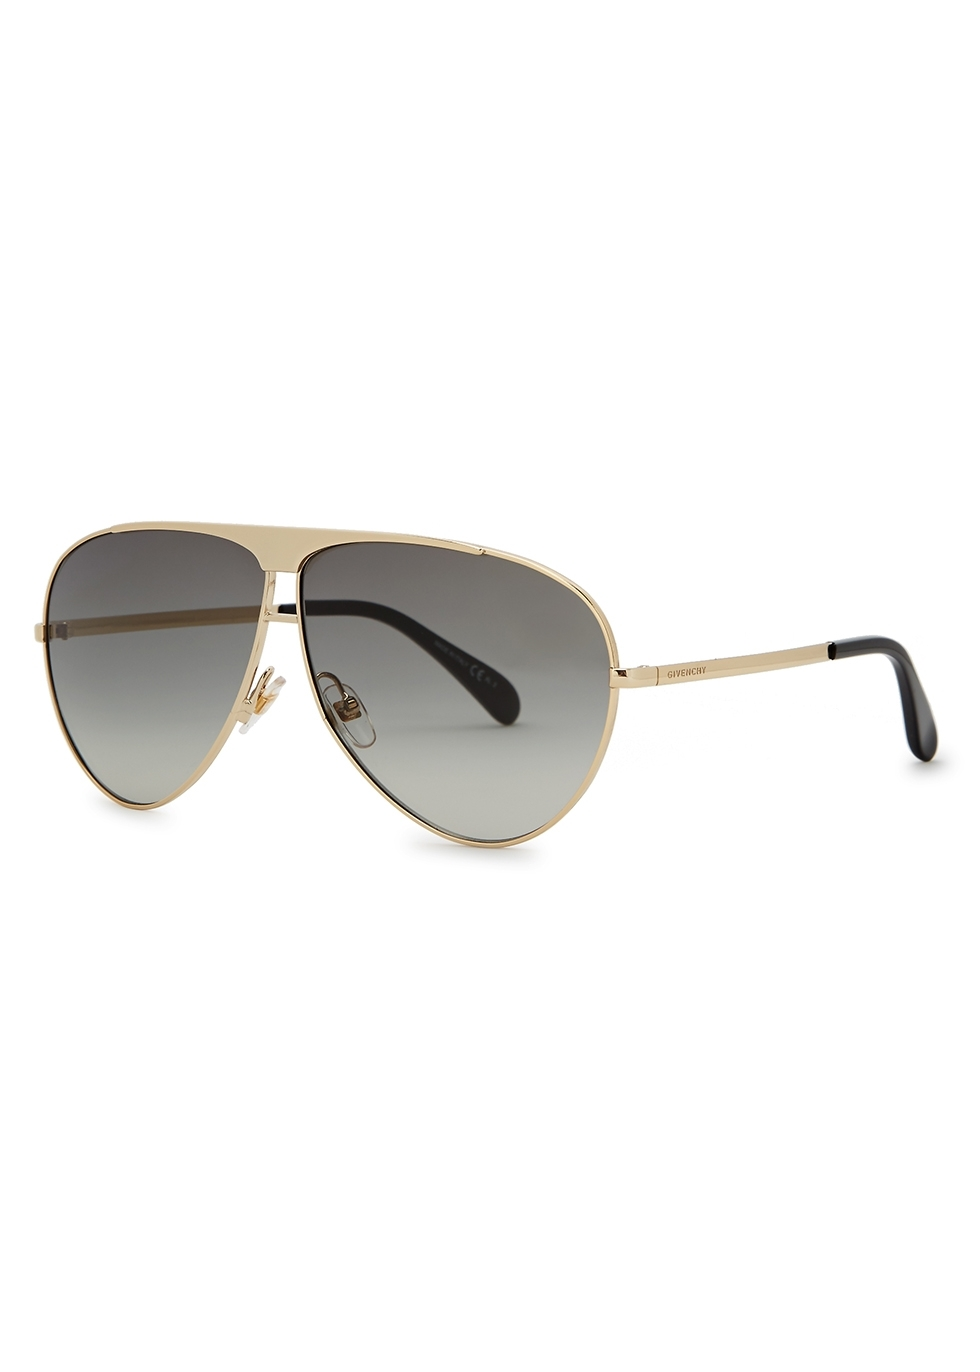 6244f6c2c6 Men s Designer Sunglasses   Eyewear - Harvey Nichols